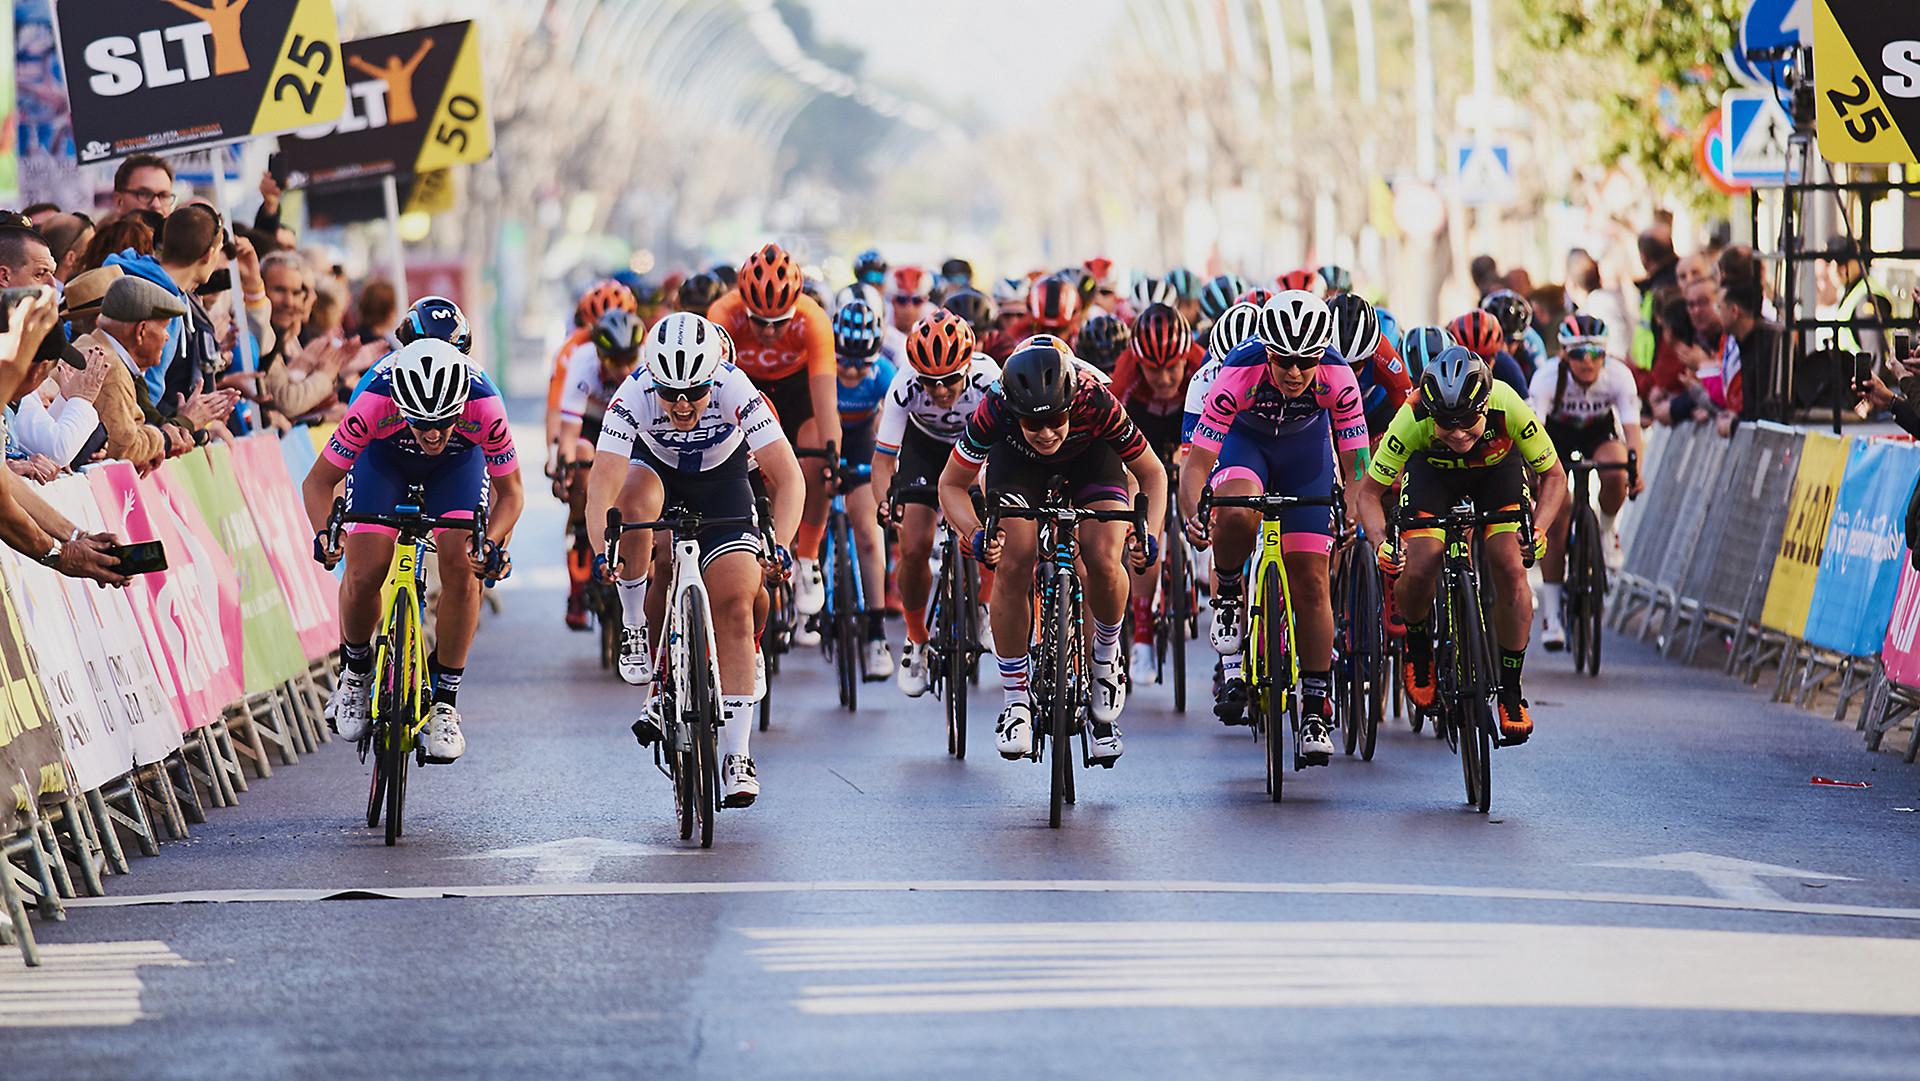 8eb8126d2dc Trek Bikes - The world's best bikes and cycling gear | Trek Bikes